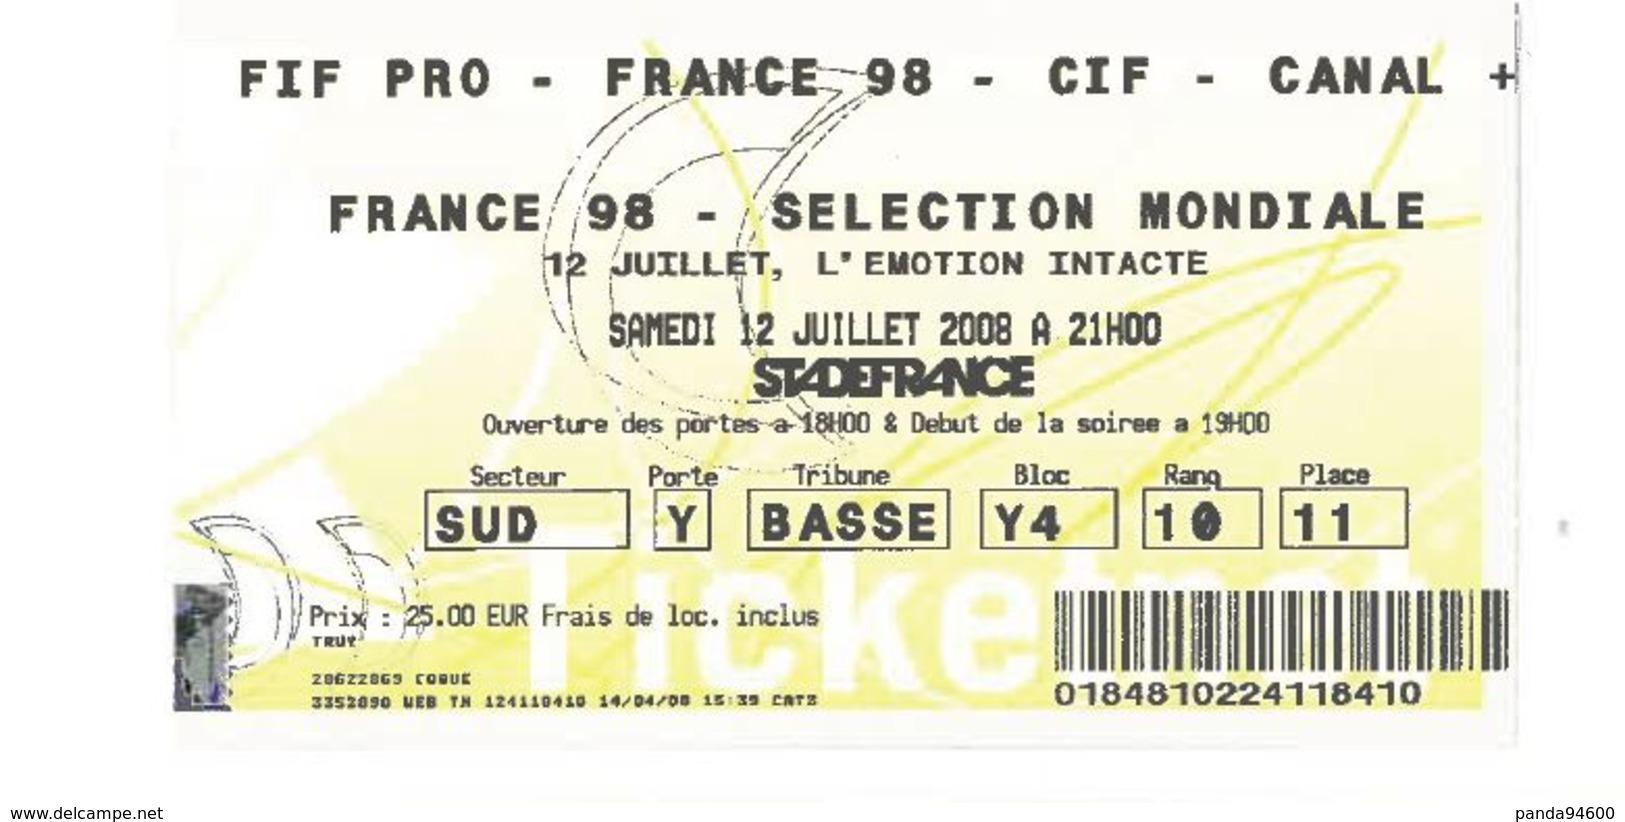 Ticket Entrée Stade De France Footbal France 98 - Sélection Mondiale 12 Juillet 2008 - Eintrittskarten